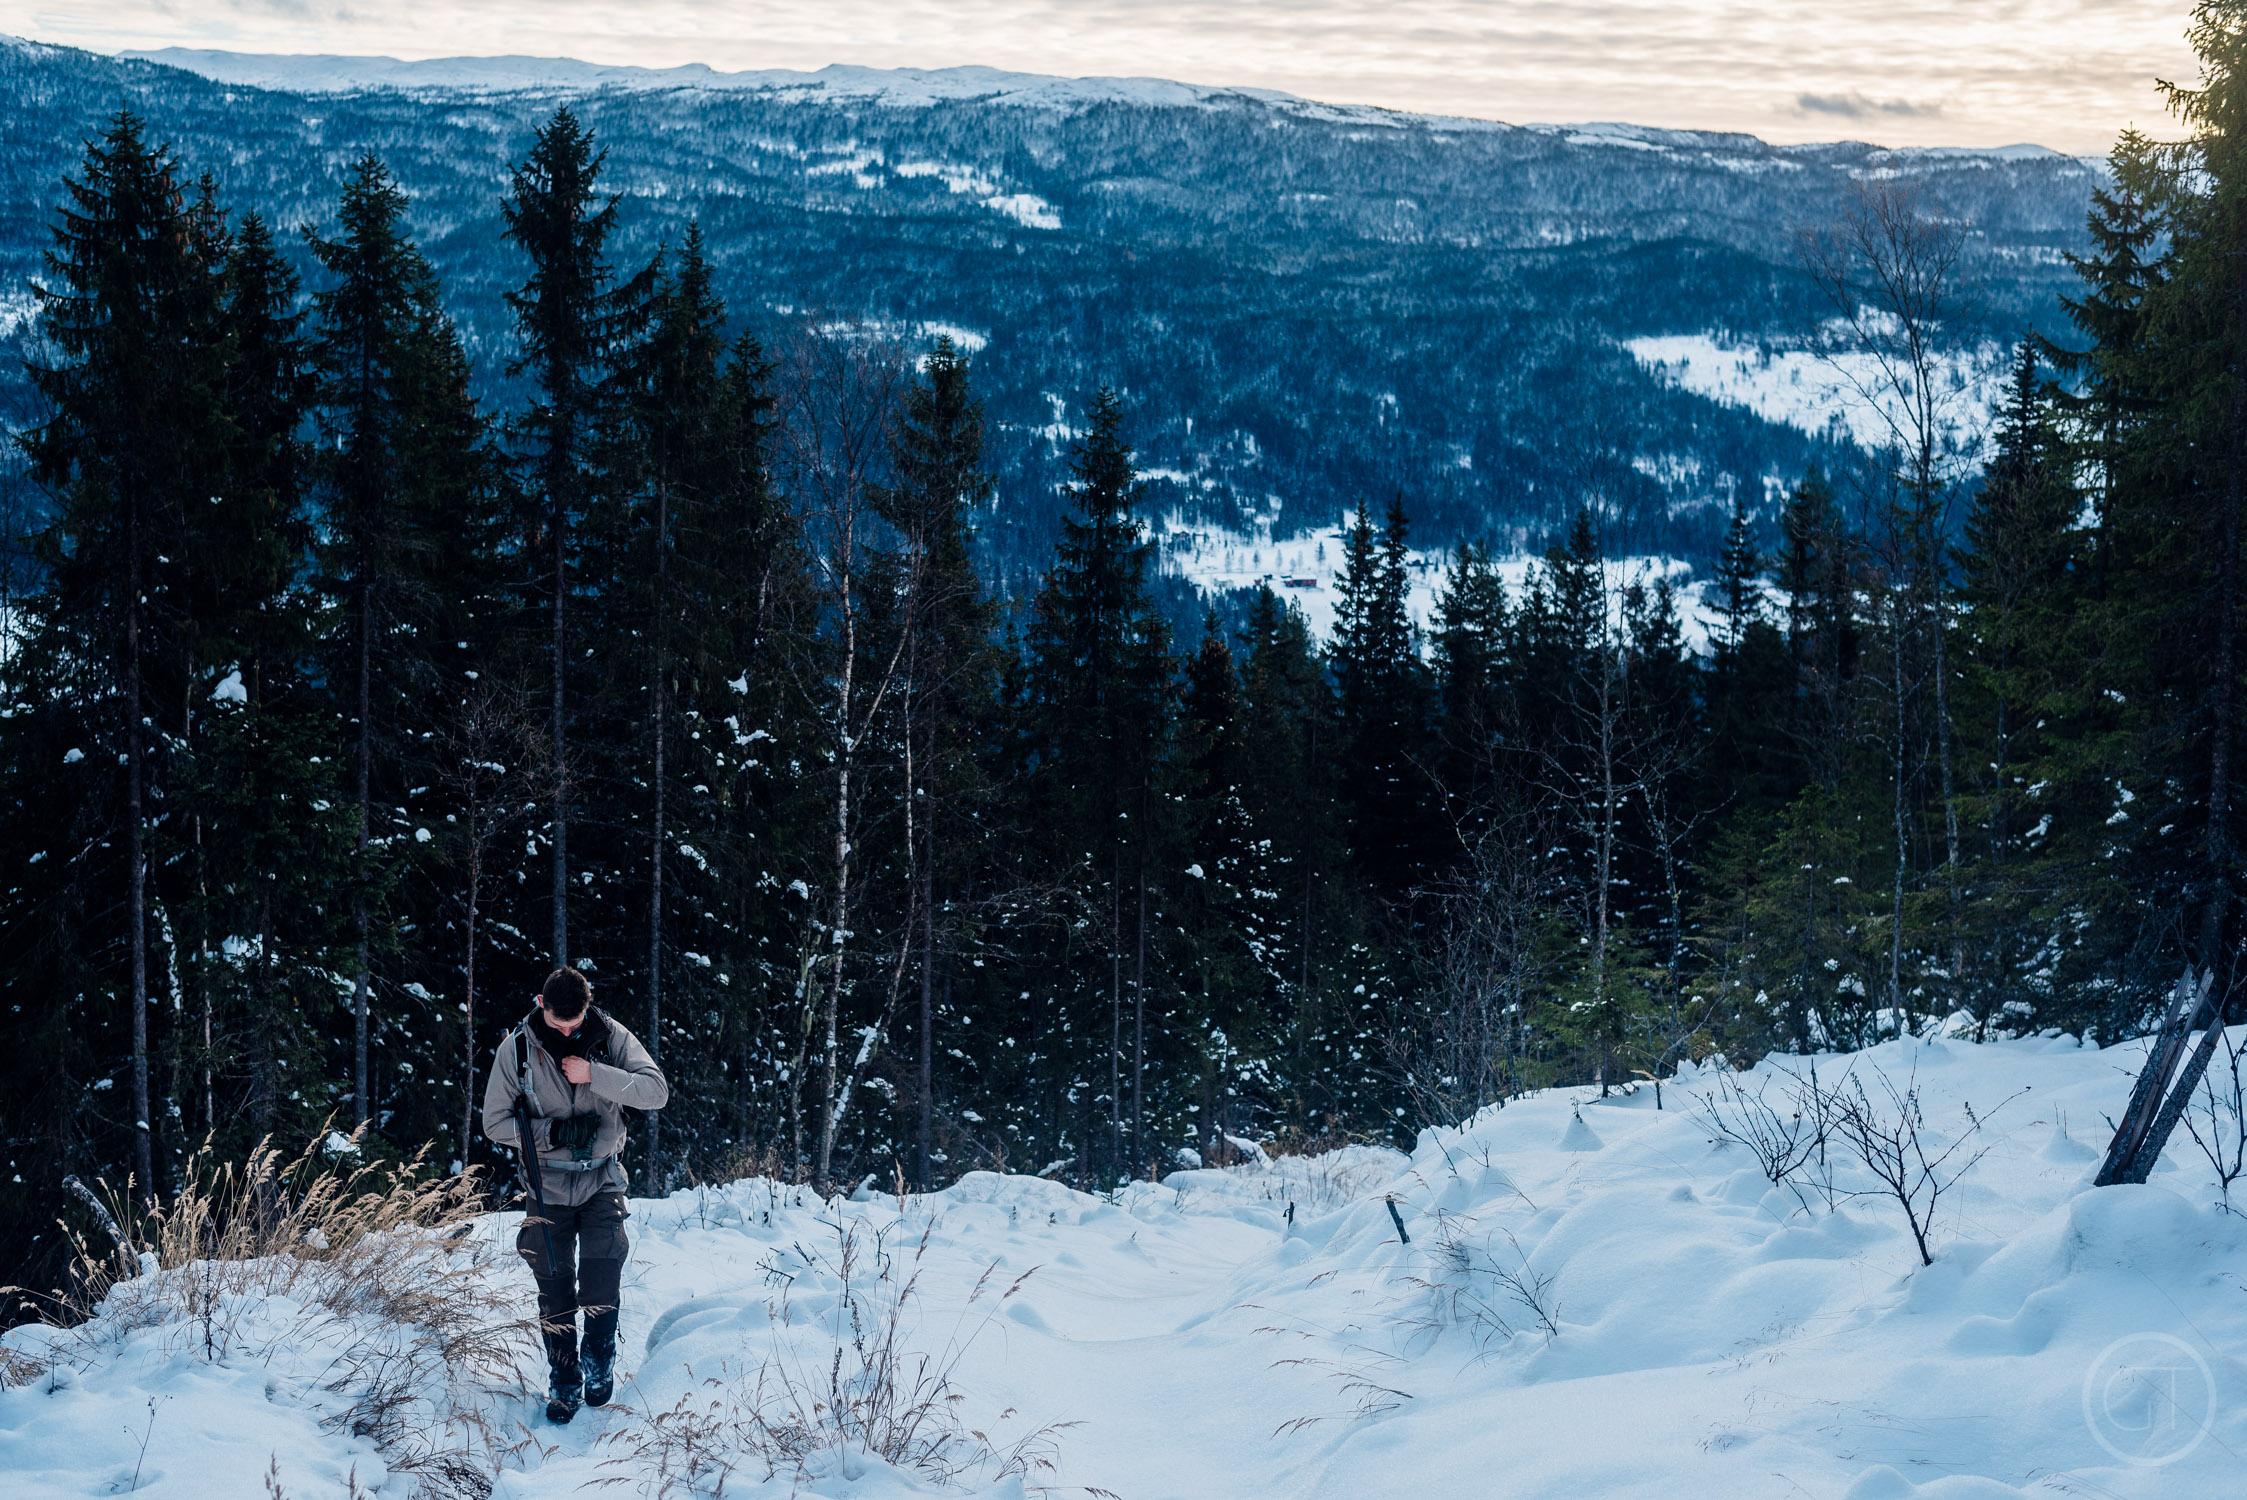 GUSTAV_THUESEN_HUNTING_NORWAY_OUTDOOR_LIFESTYLE_PHOTOGRAPHER_PROFESSIONAL-21.jpg